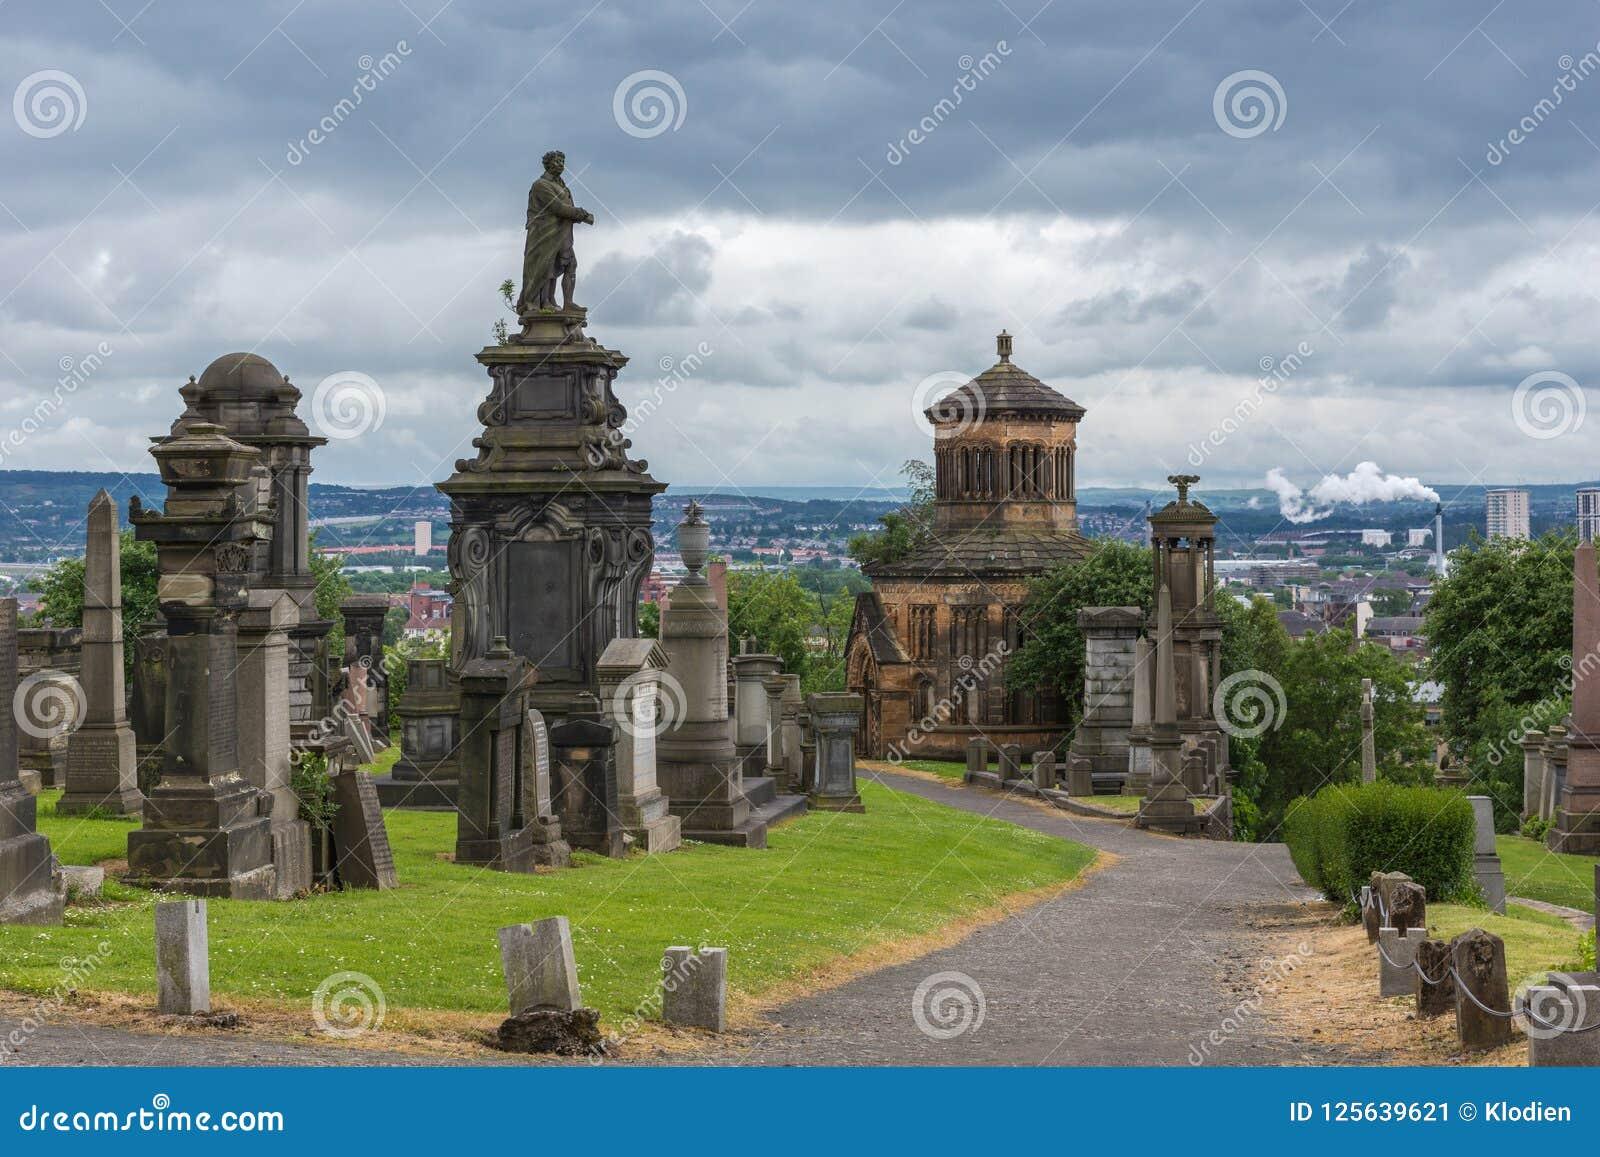 Statue de William McGavin sur le dessus t Glasgow Necropolis, Scotlan de colline